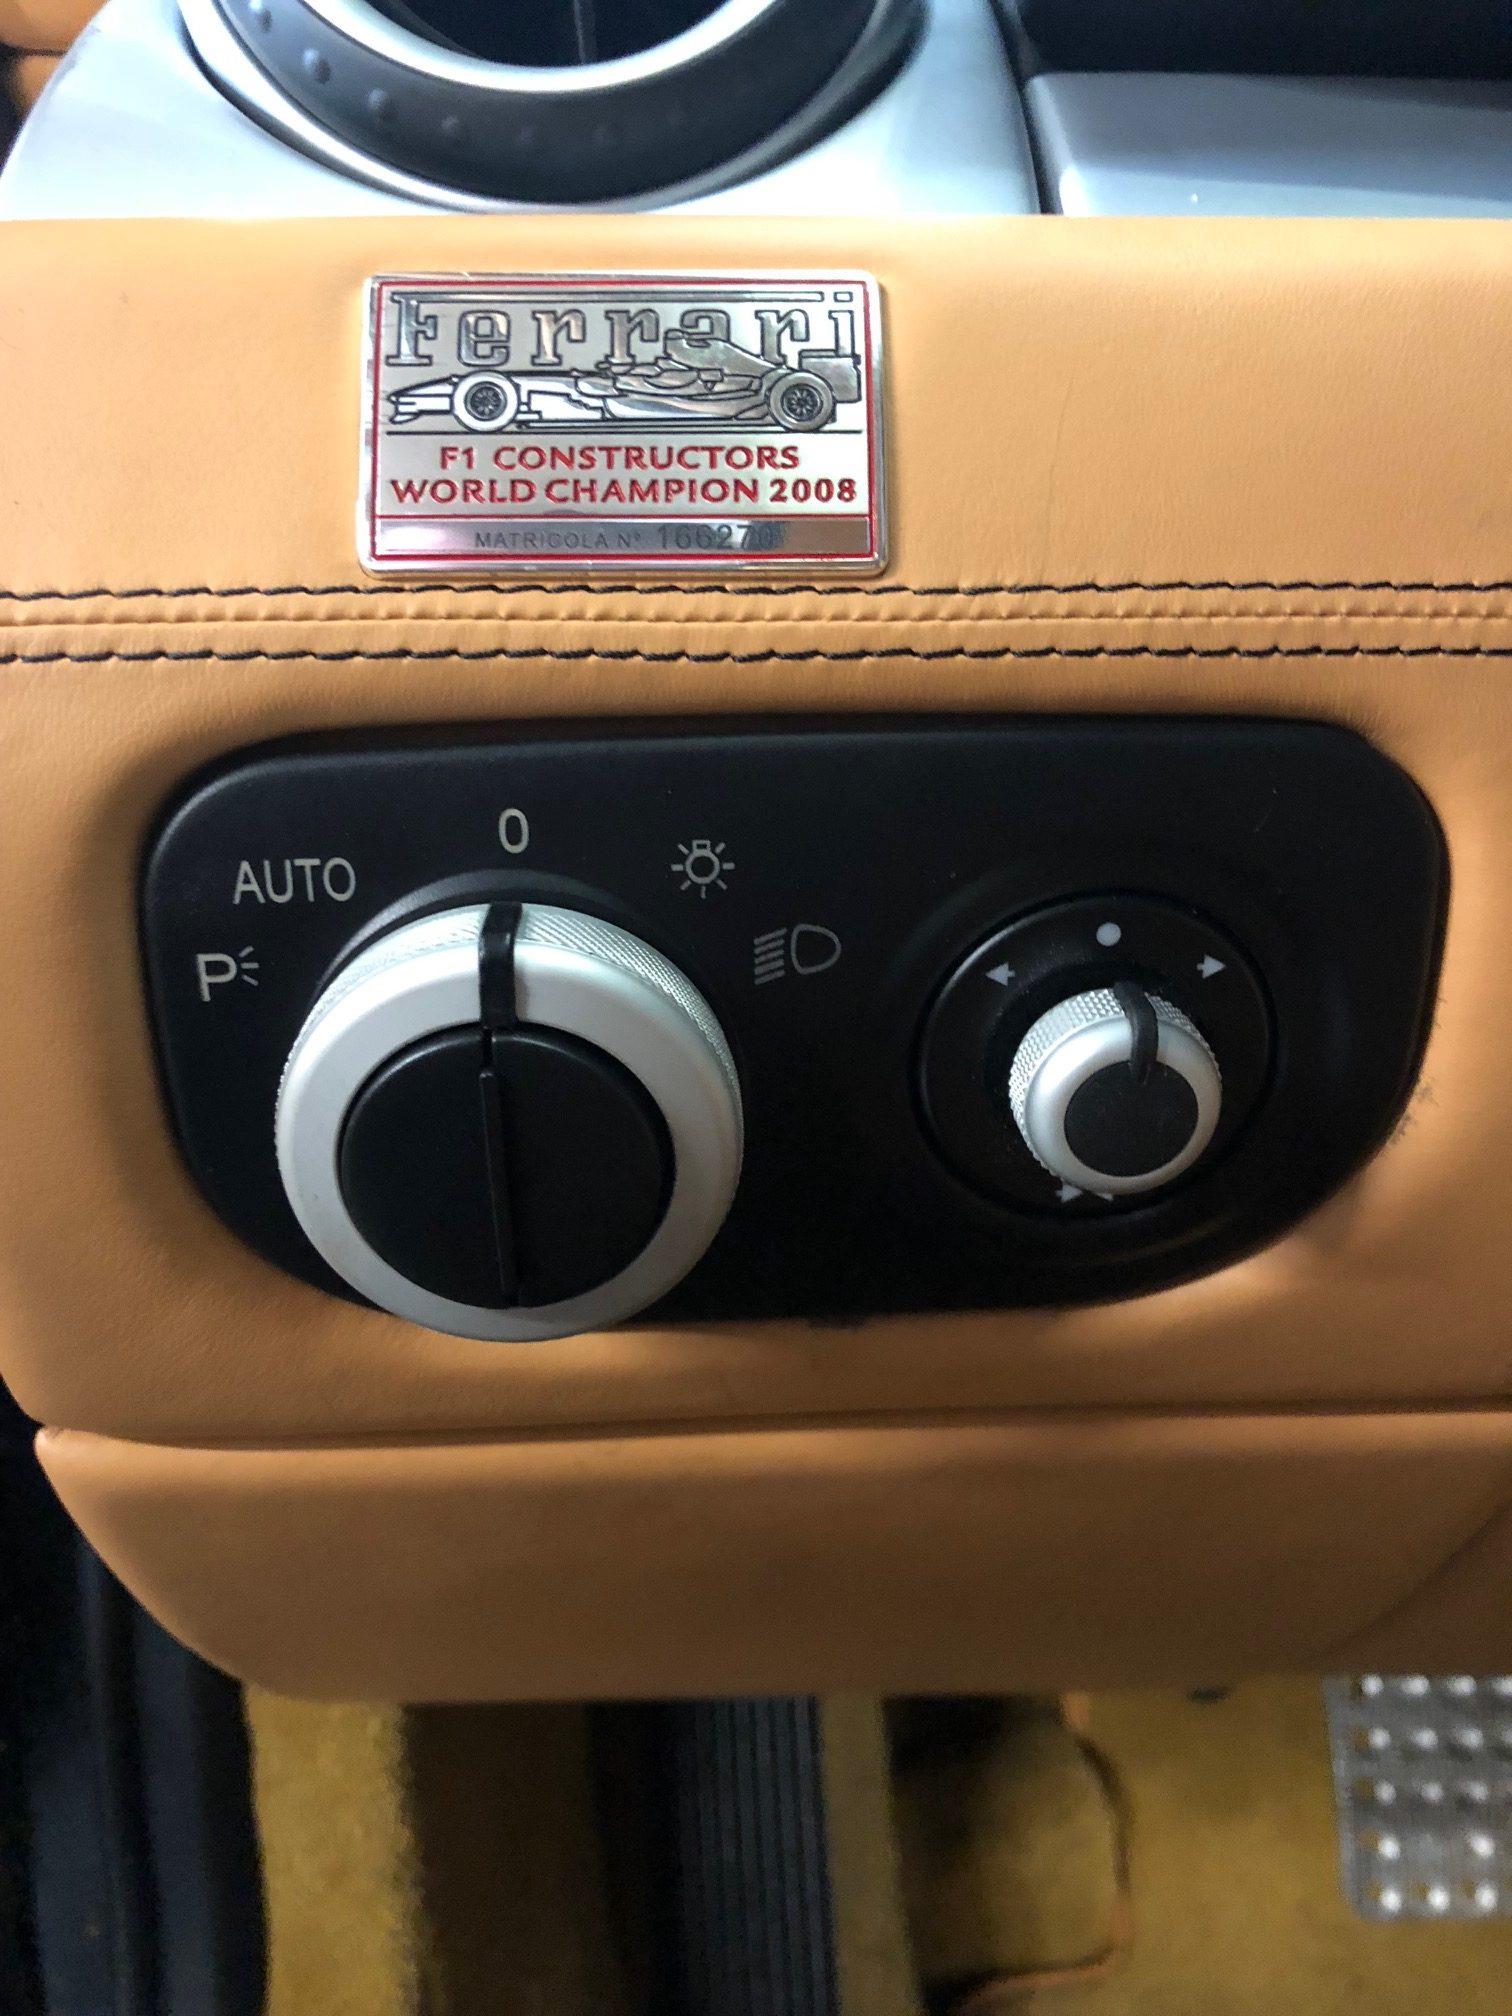 headlight control switch for a 2009 Ferrari 612